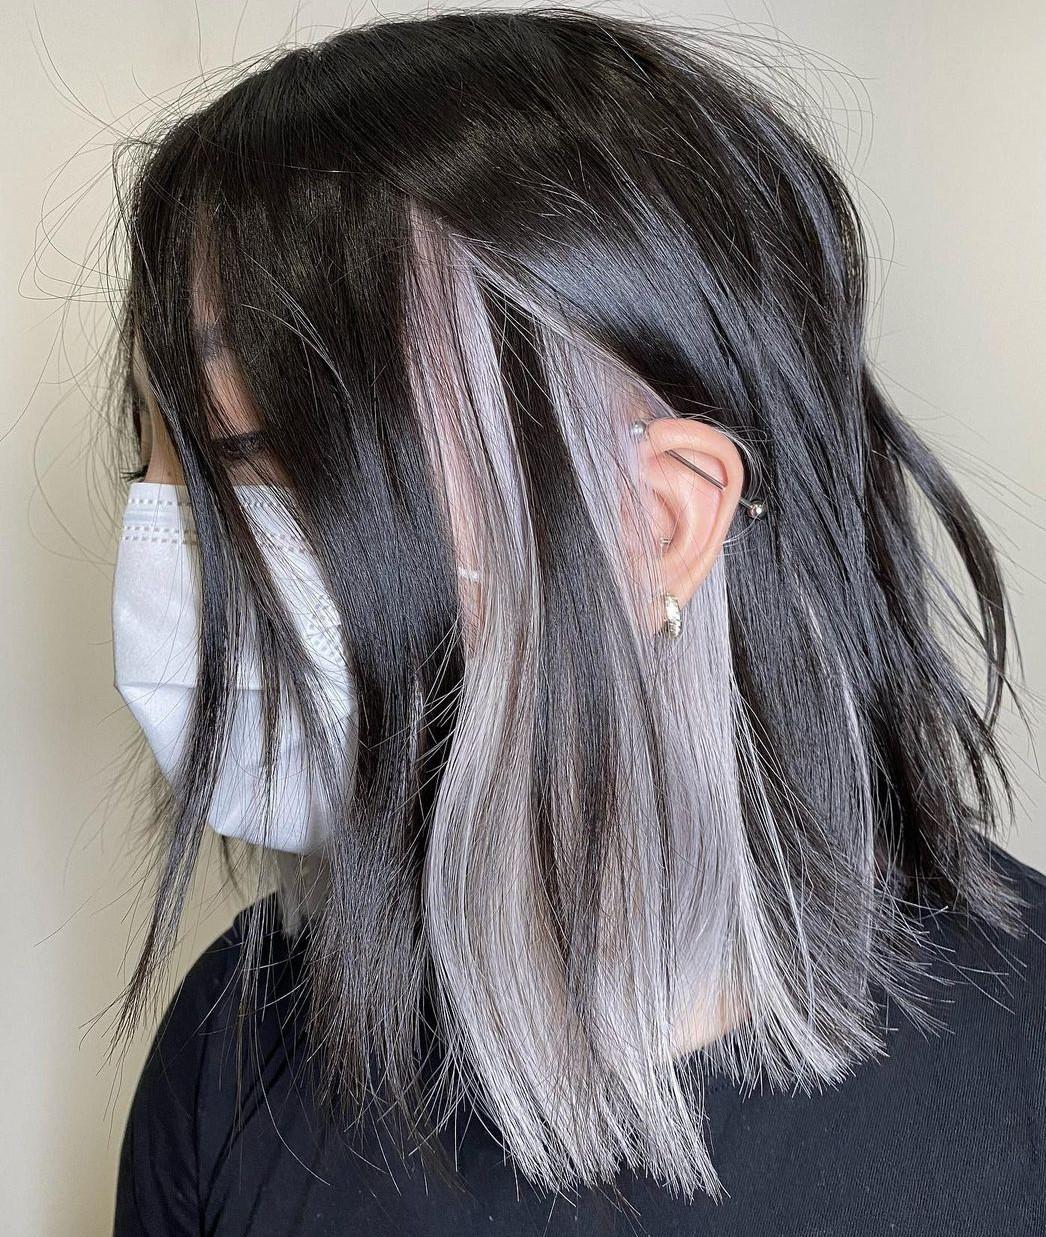 Dark Hair with Silver Peekaboo Highlights